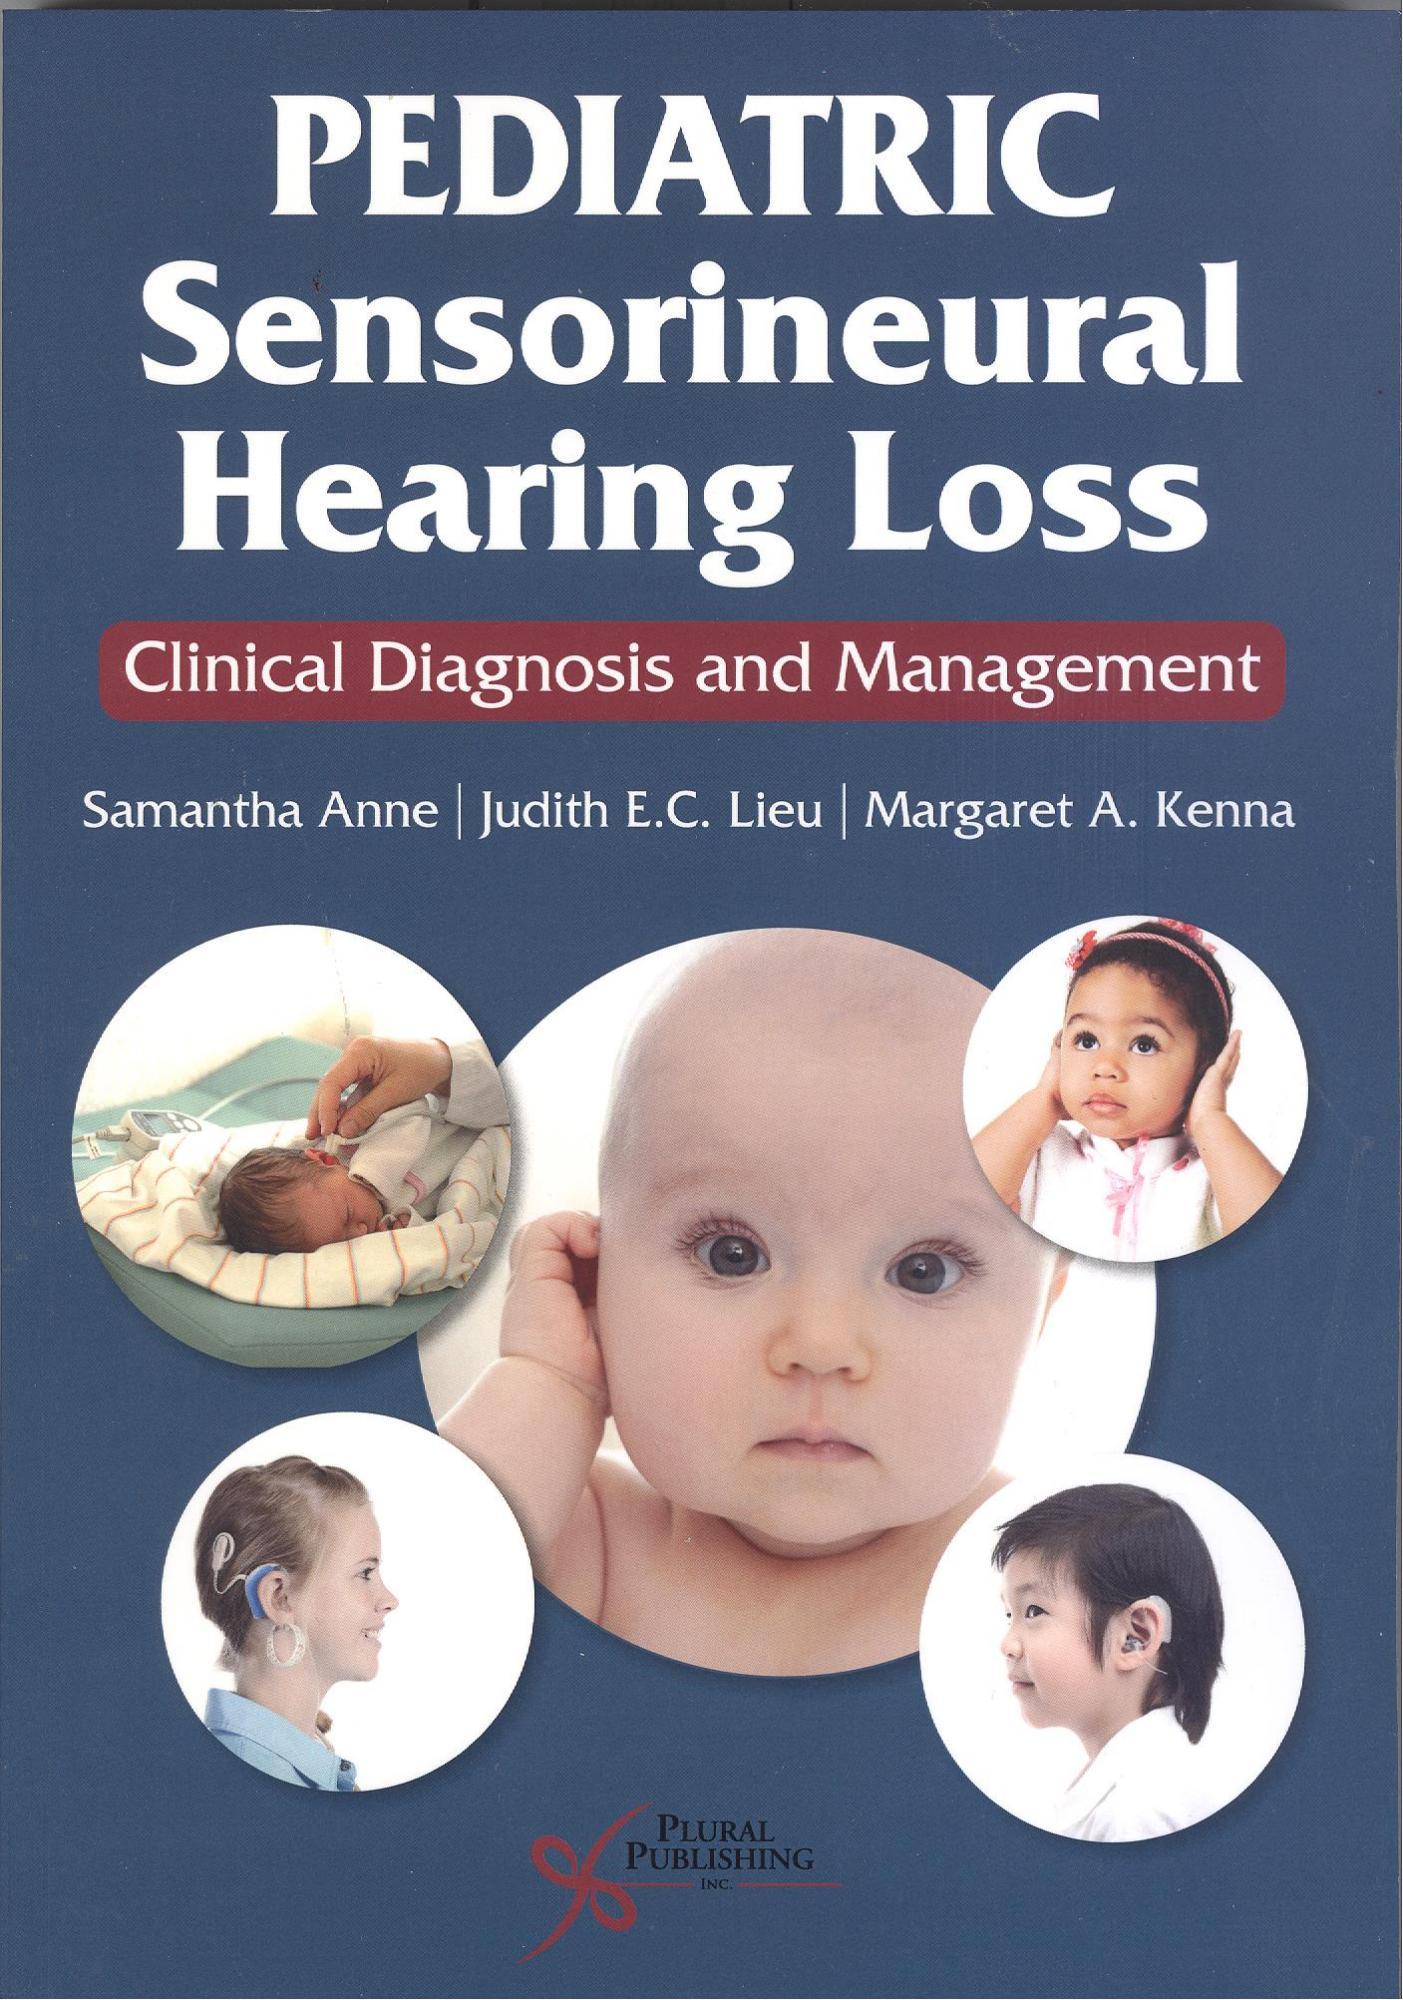 Pediatric Sensorineural Heating Loss: Clinical Diagnosis and Management